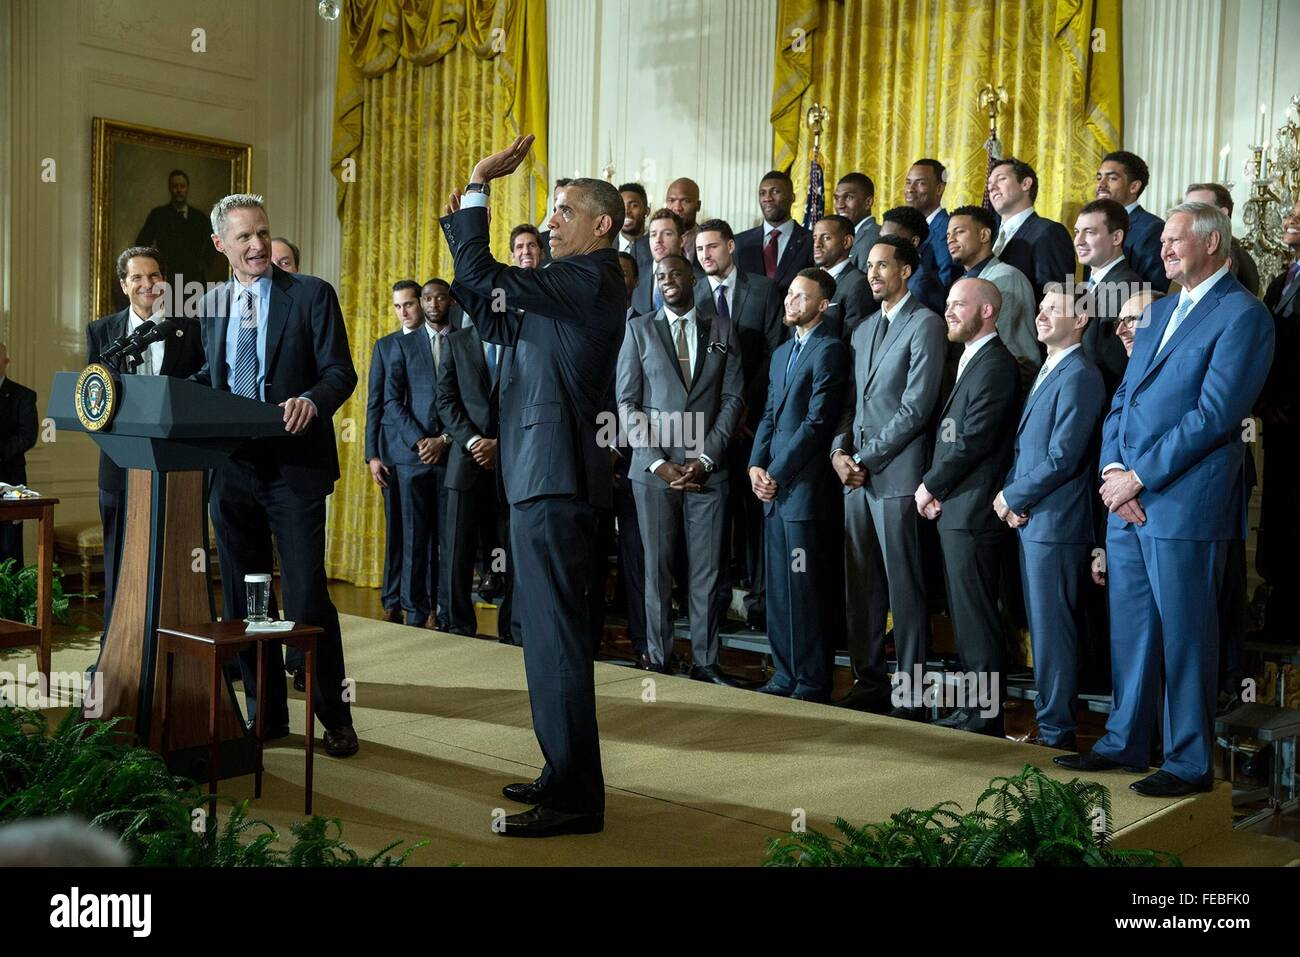 Washington DC, USA. 05th Feb, 2016. U.S President Barack Obama clowns around with coach Steve Kerr as he meets with - Stock Image